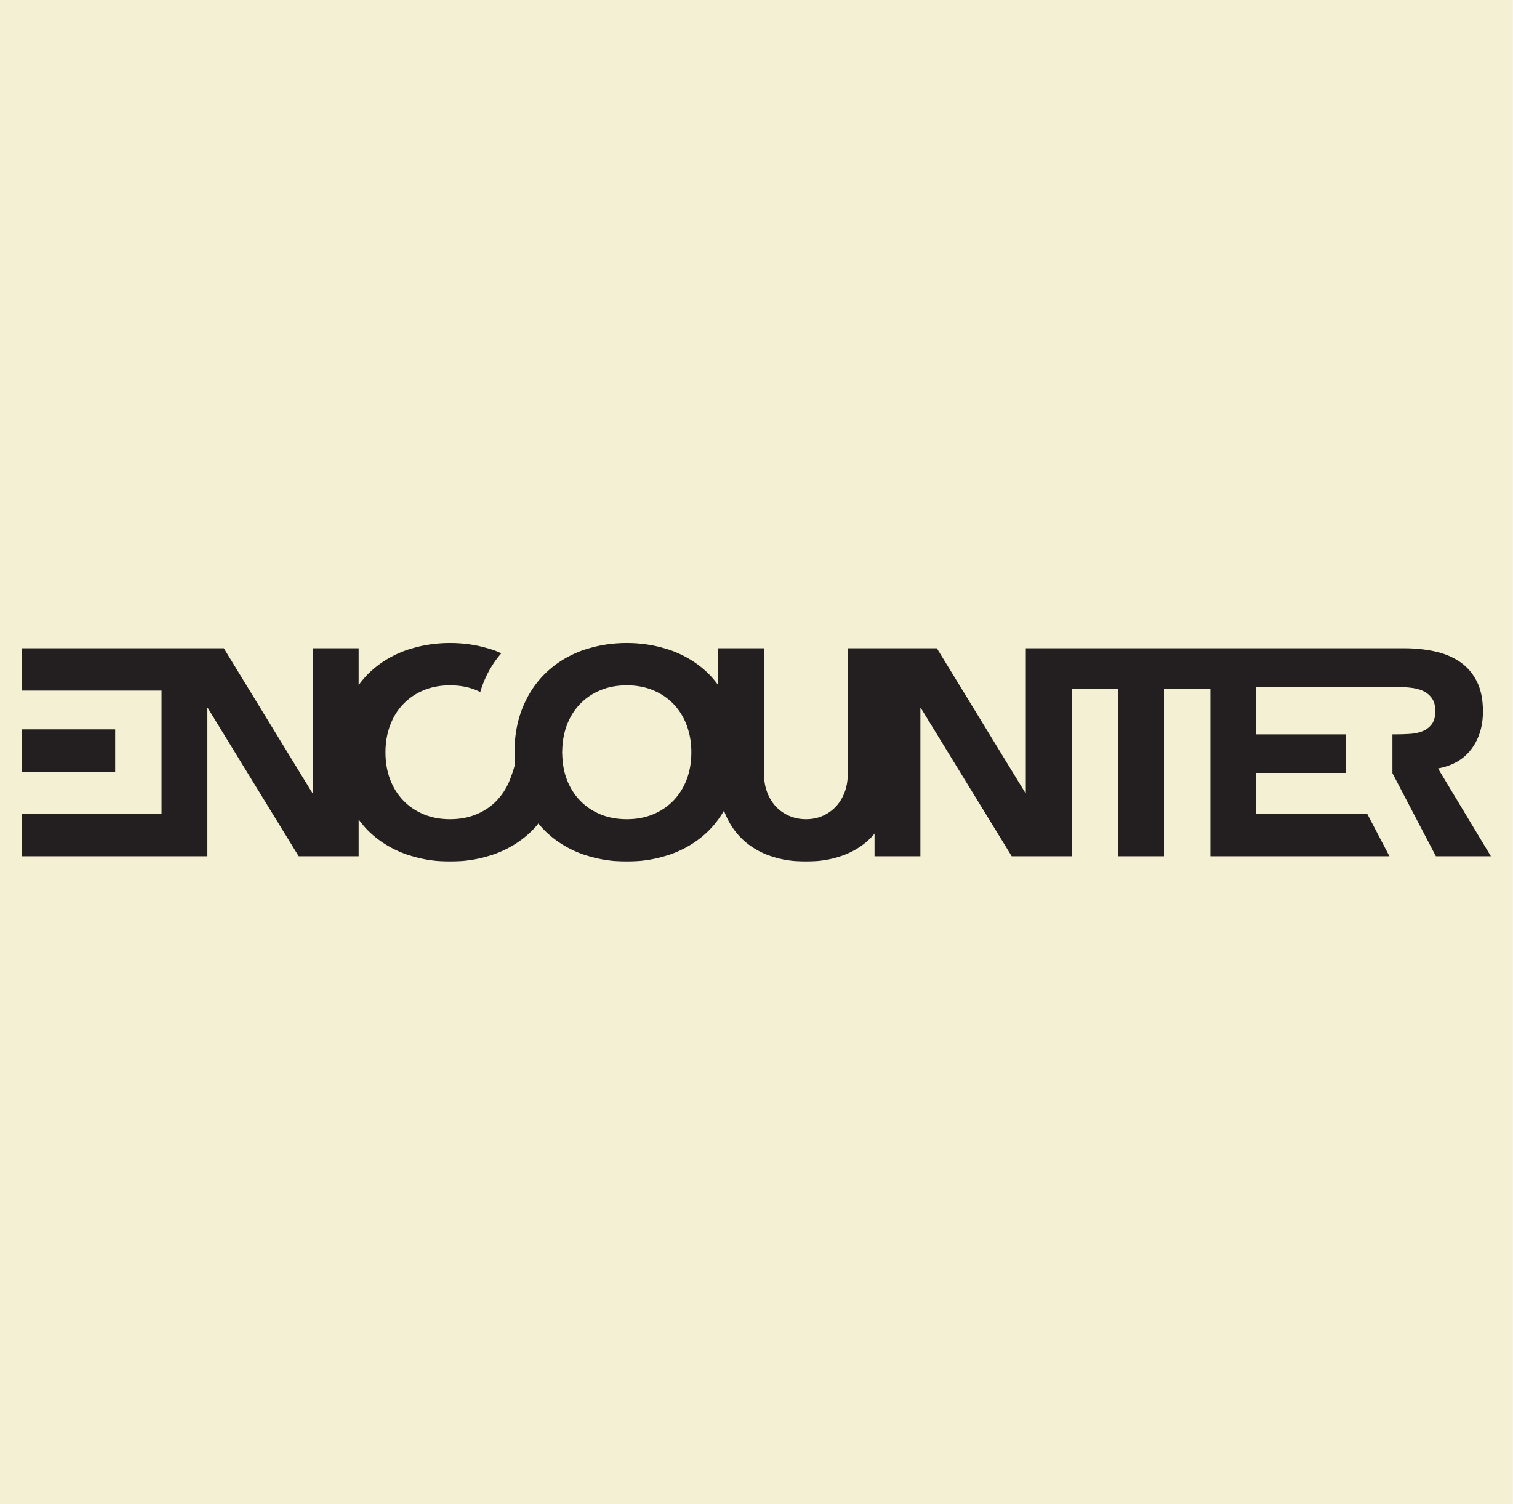 The Encounter Magazine